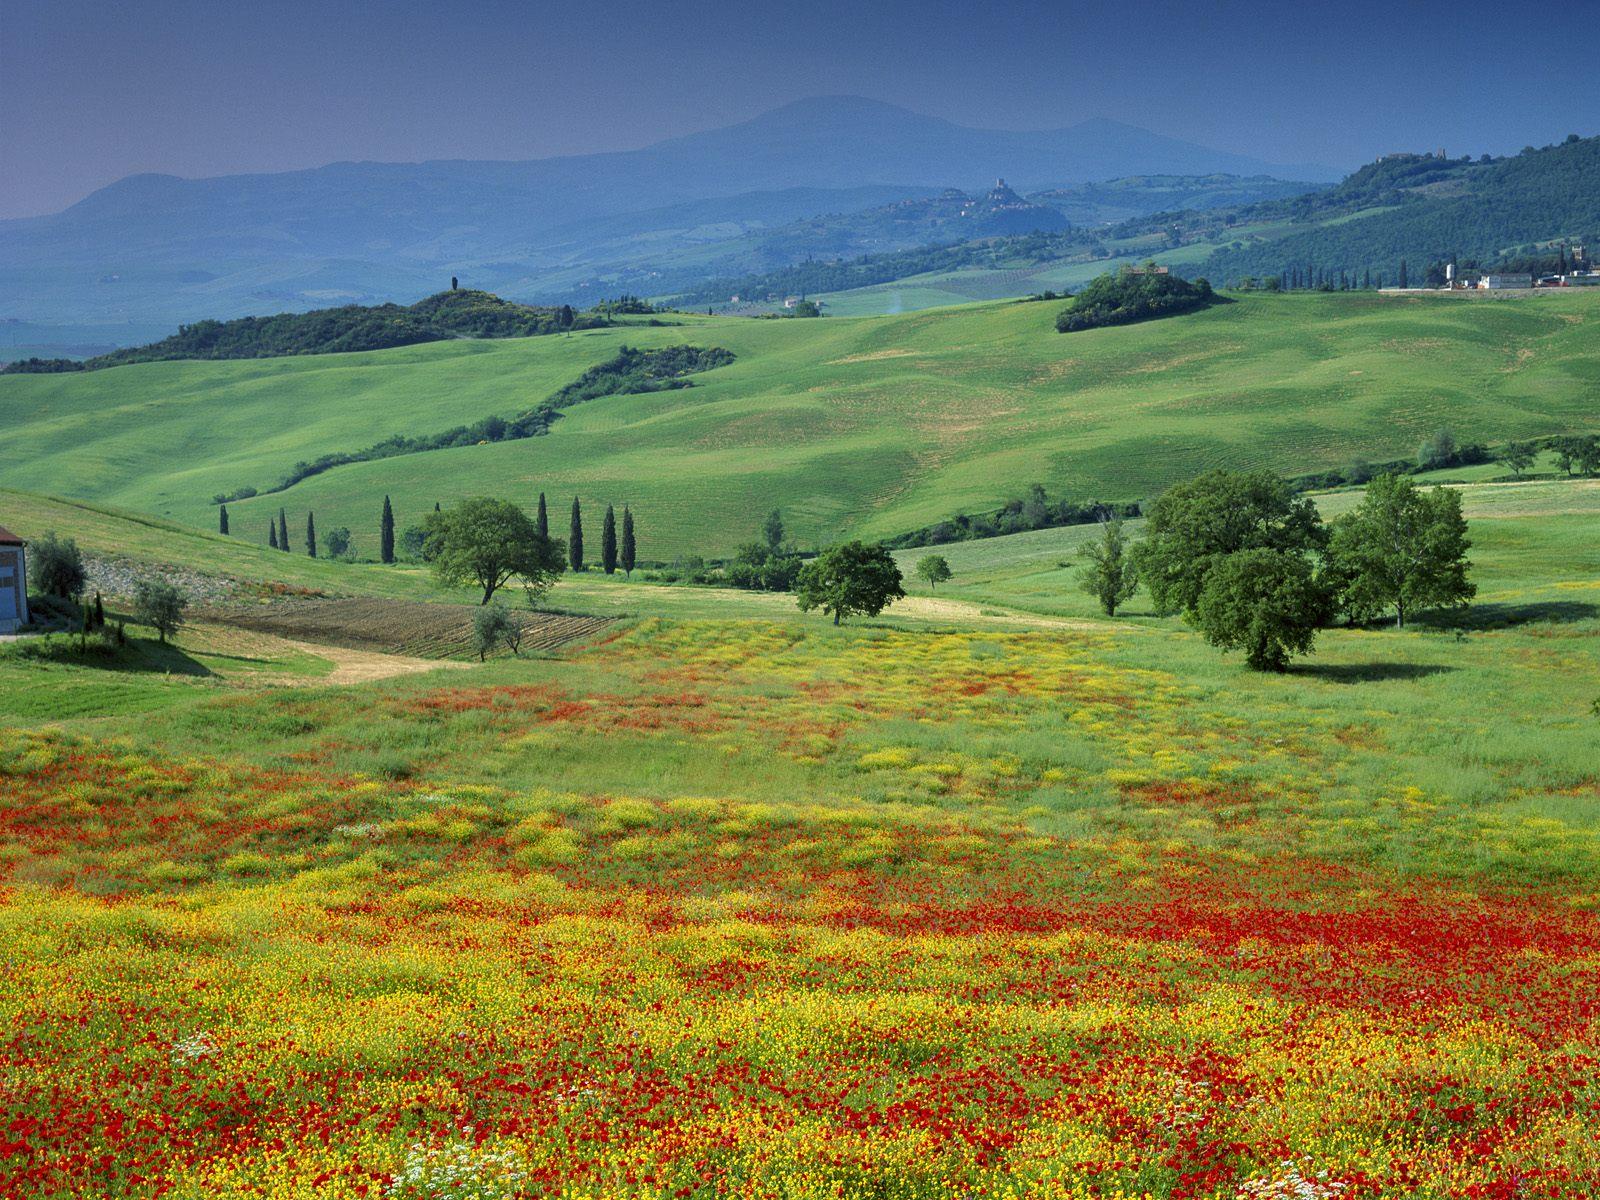 San Quirico Tuscany Italy.jpg